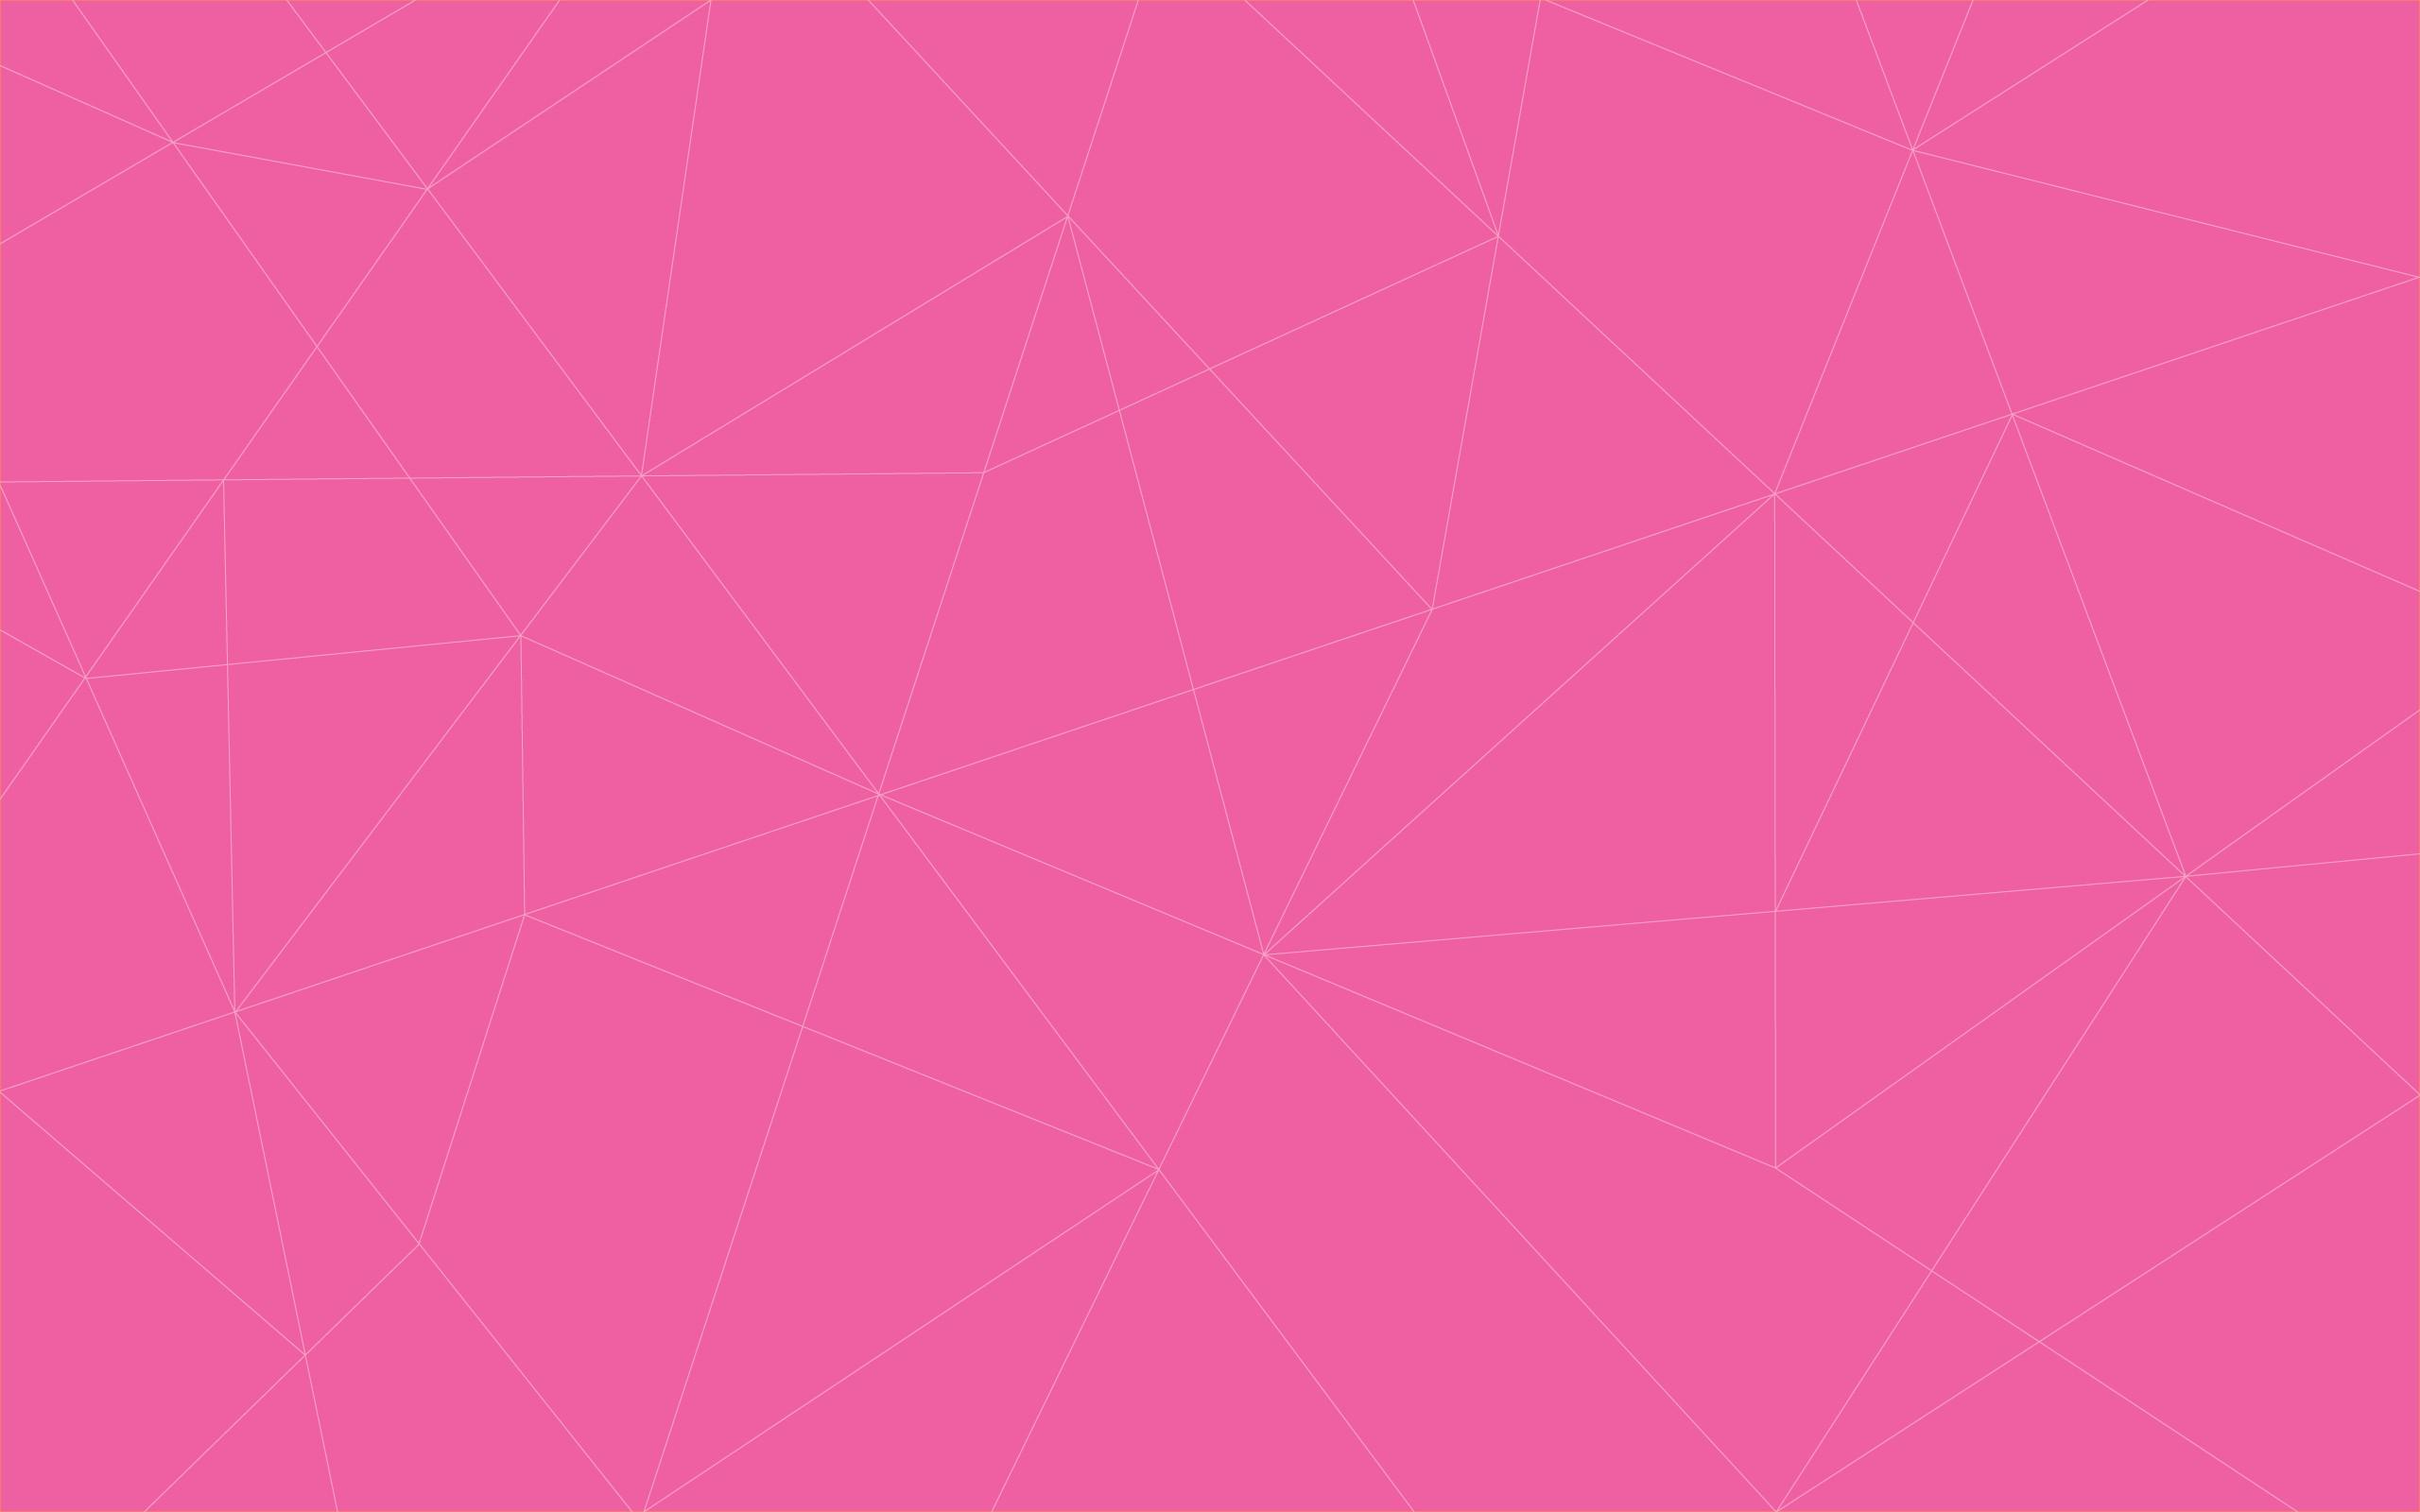 Simple Girl Wallpaper Pc Pink Backgrounds For Desktop 60 Images